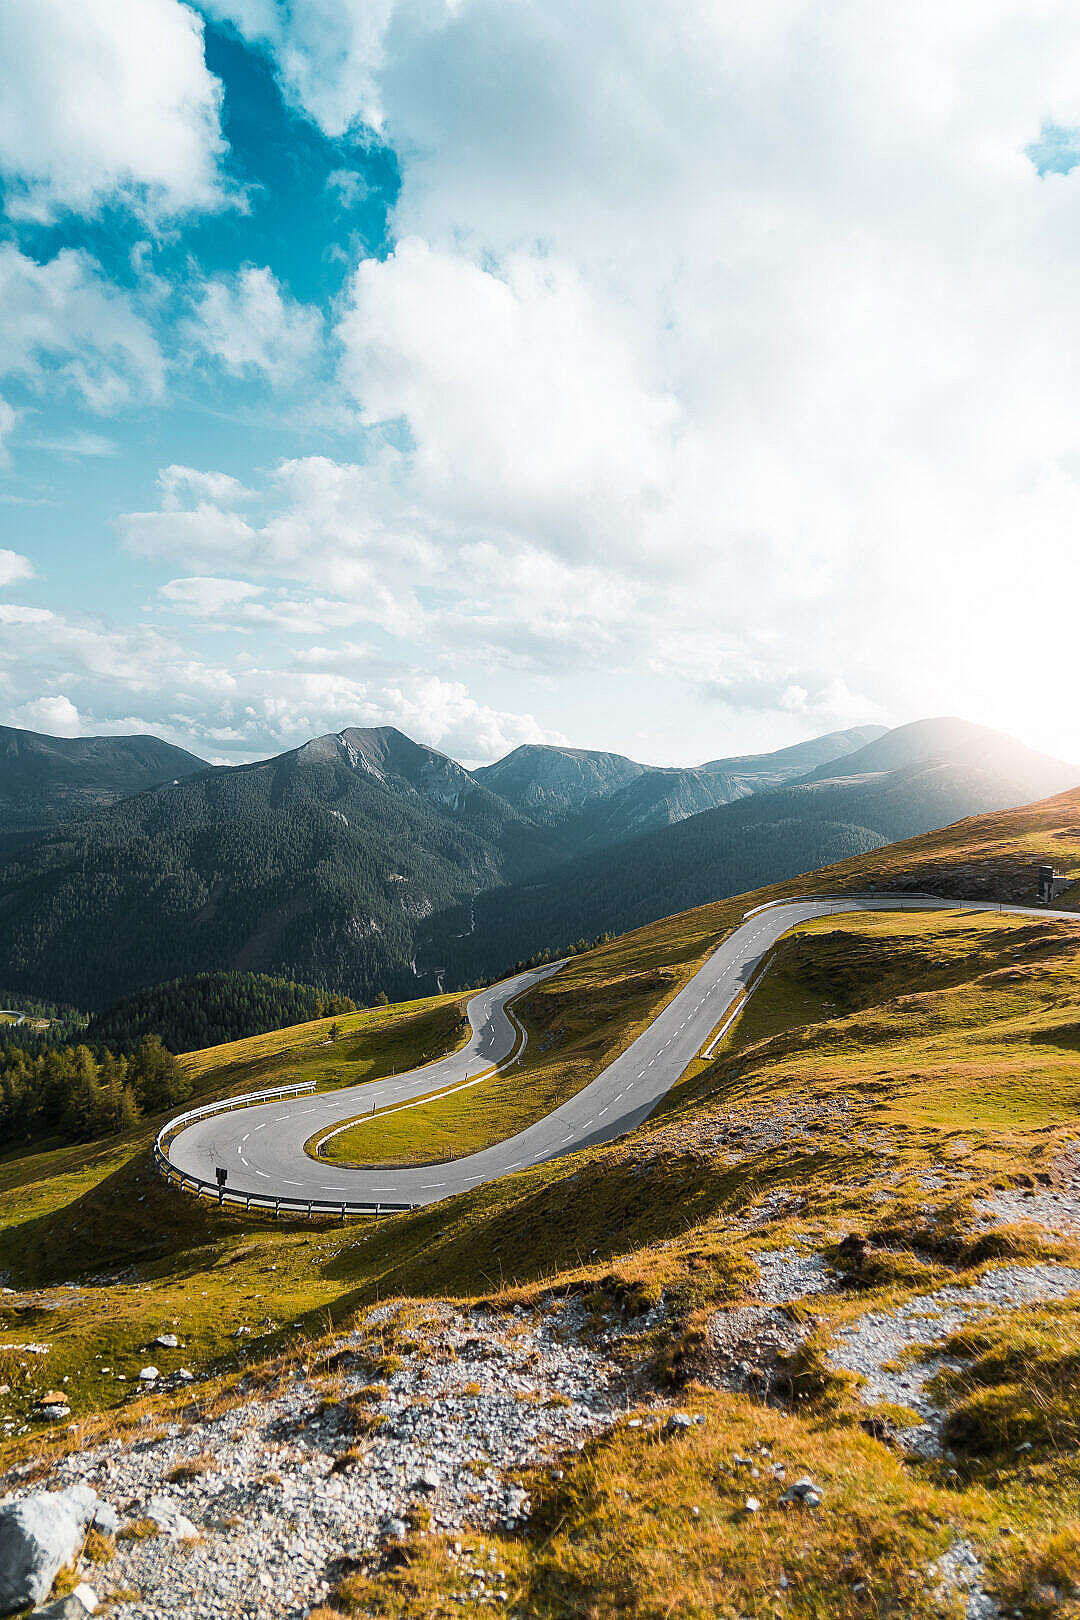 Download Nockalm High Alpine Mountain Road Hairpin Turn FREE Stock Photo